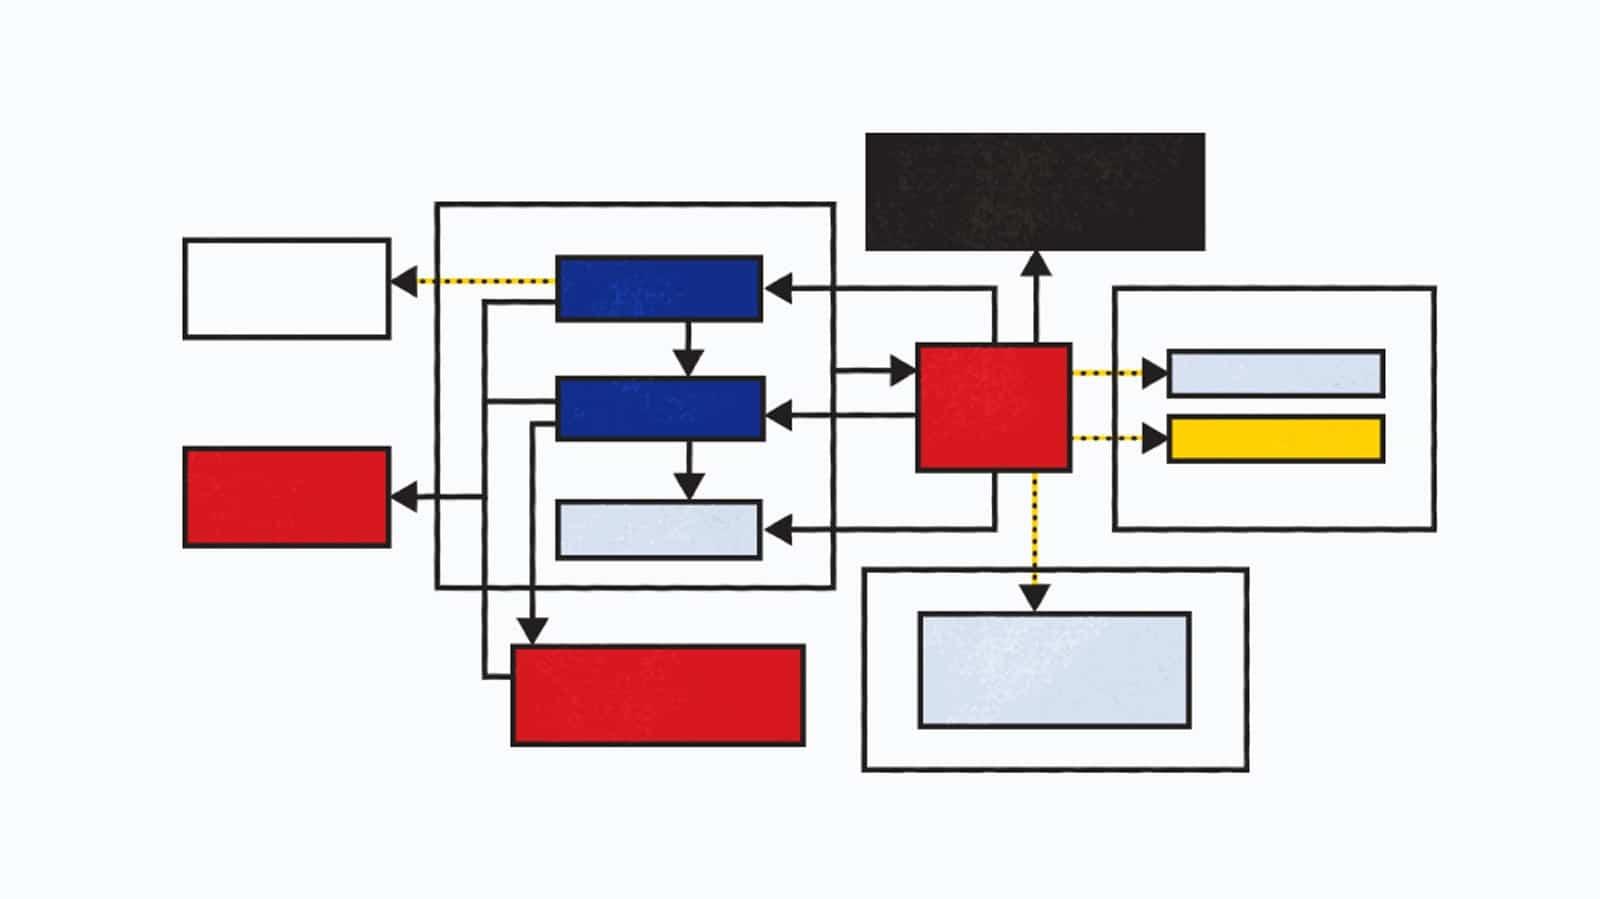 Design APIs: The Evolution of Design Systems by Matthew Ström